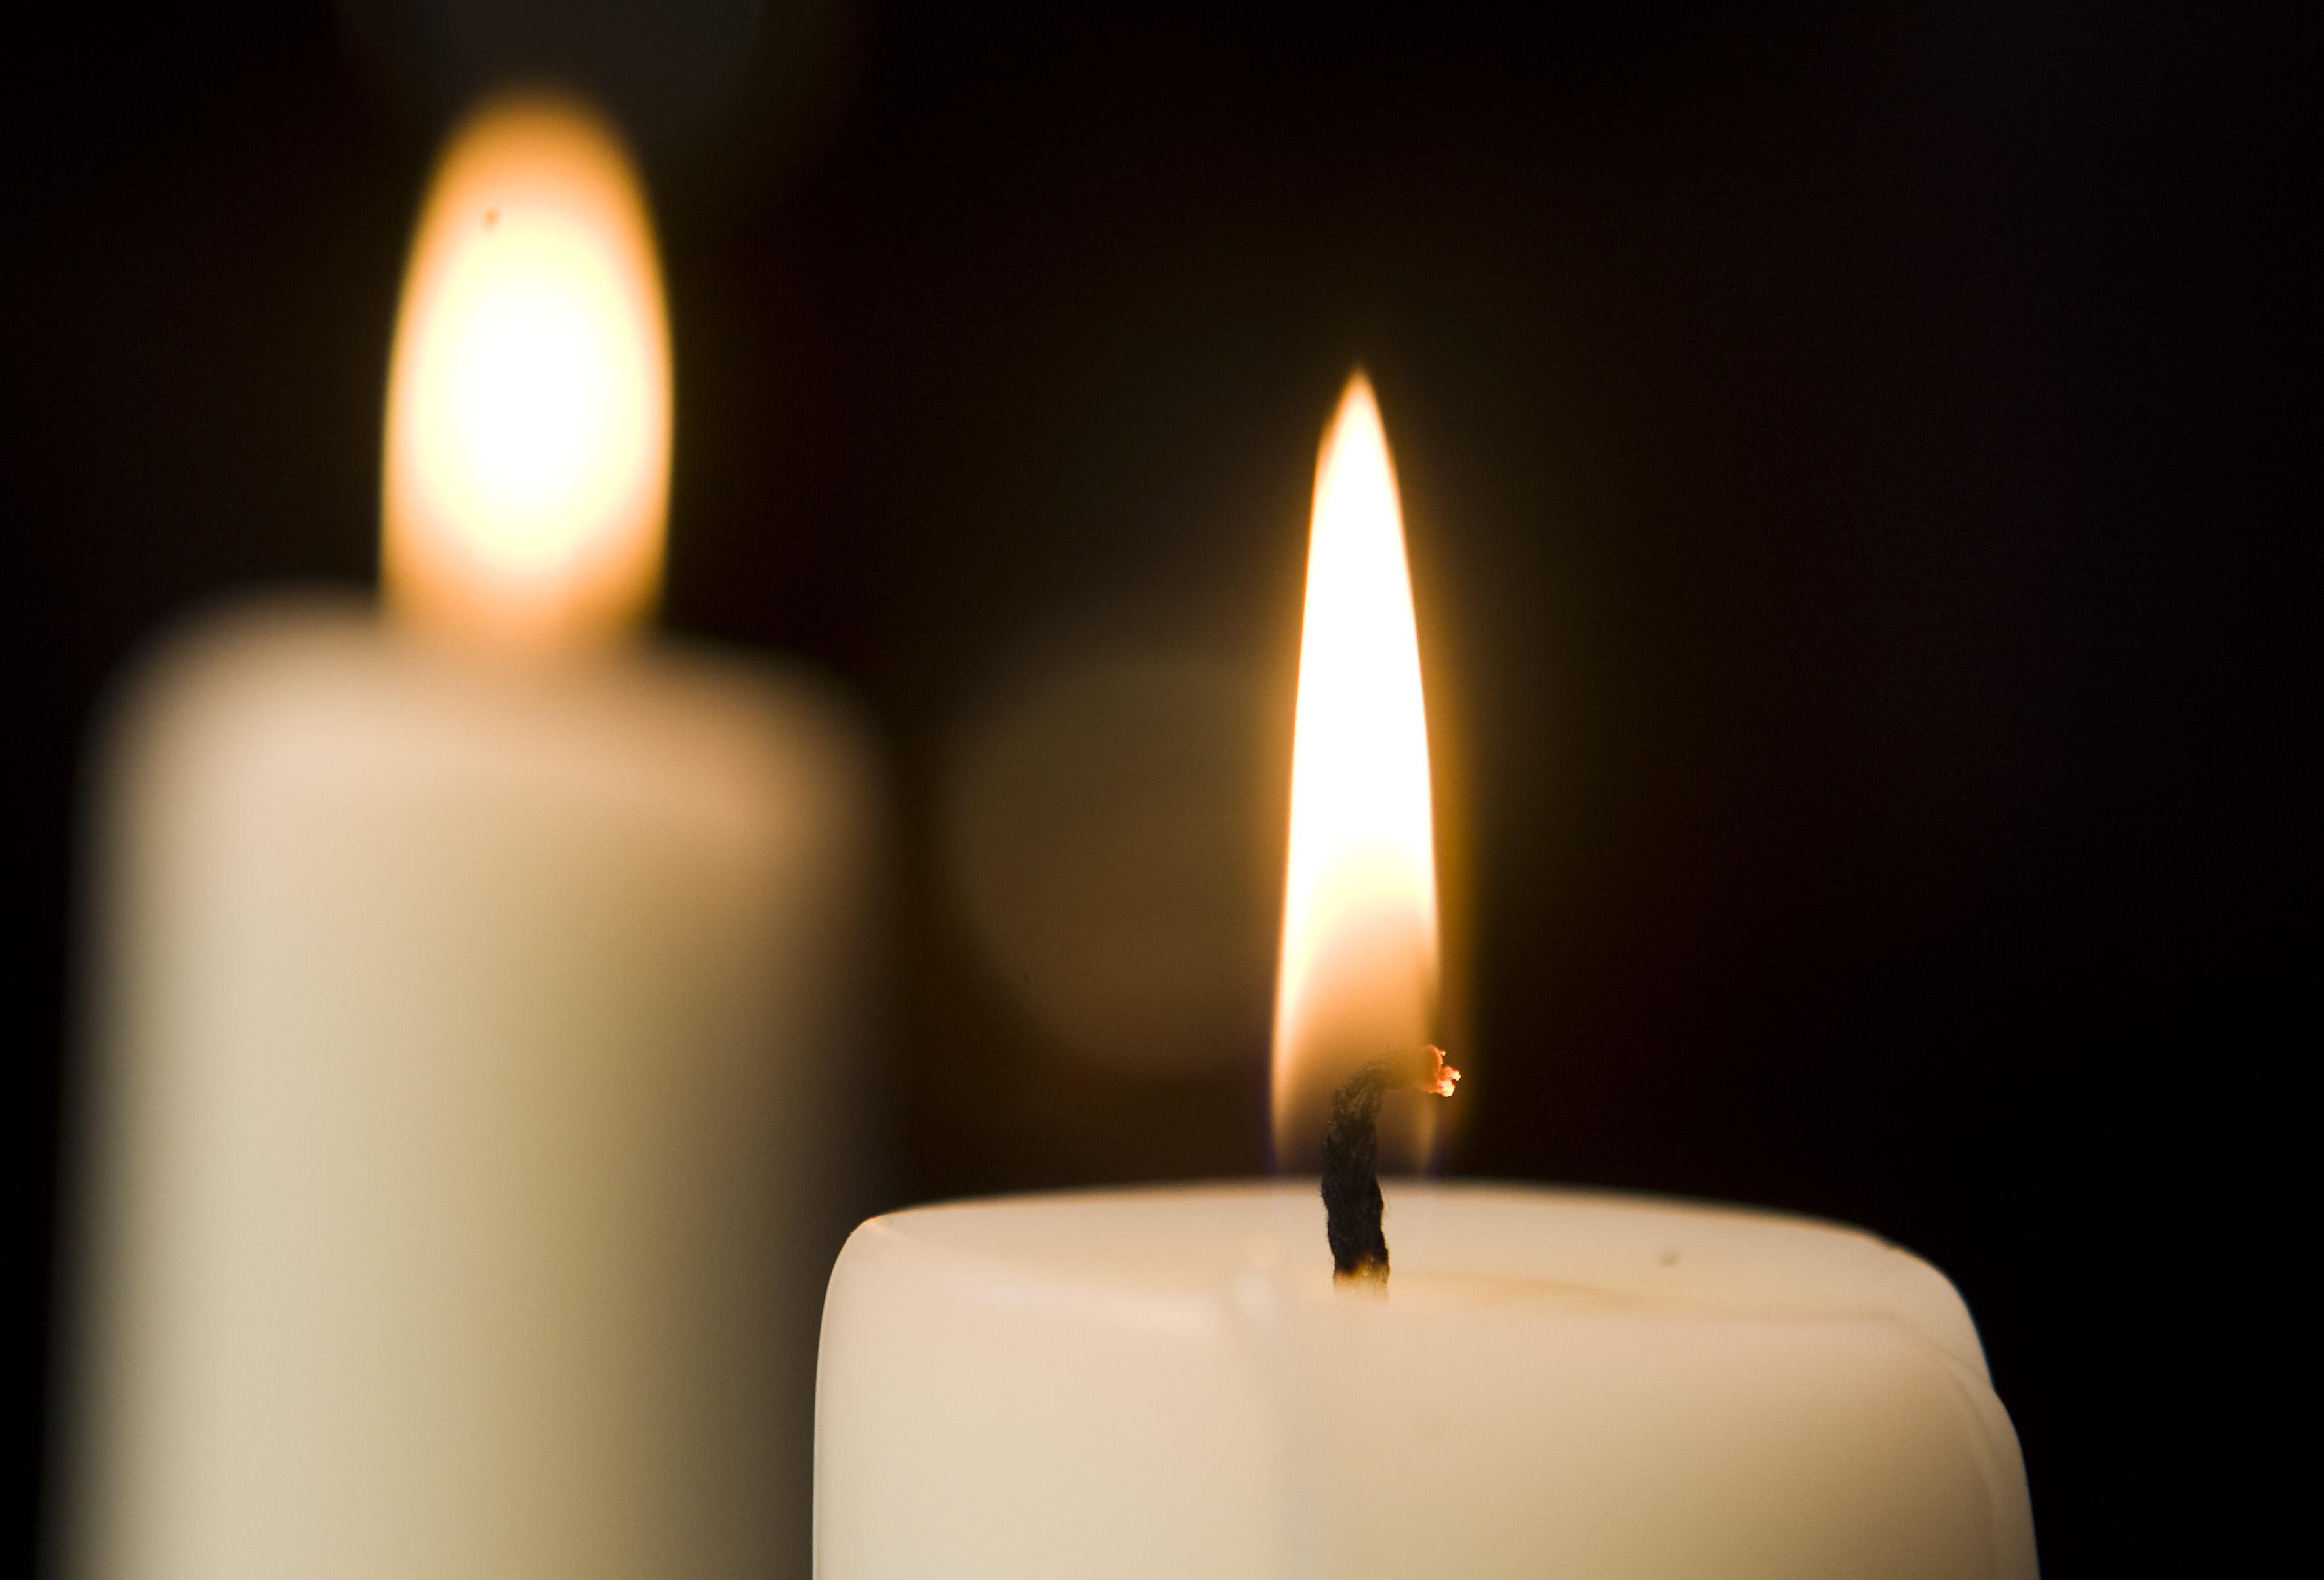 Gooi- en Eemlander wil slachtoffers van corona gedenken [oproep]